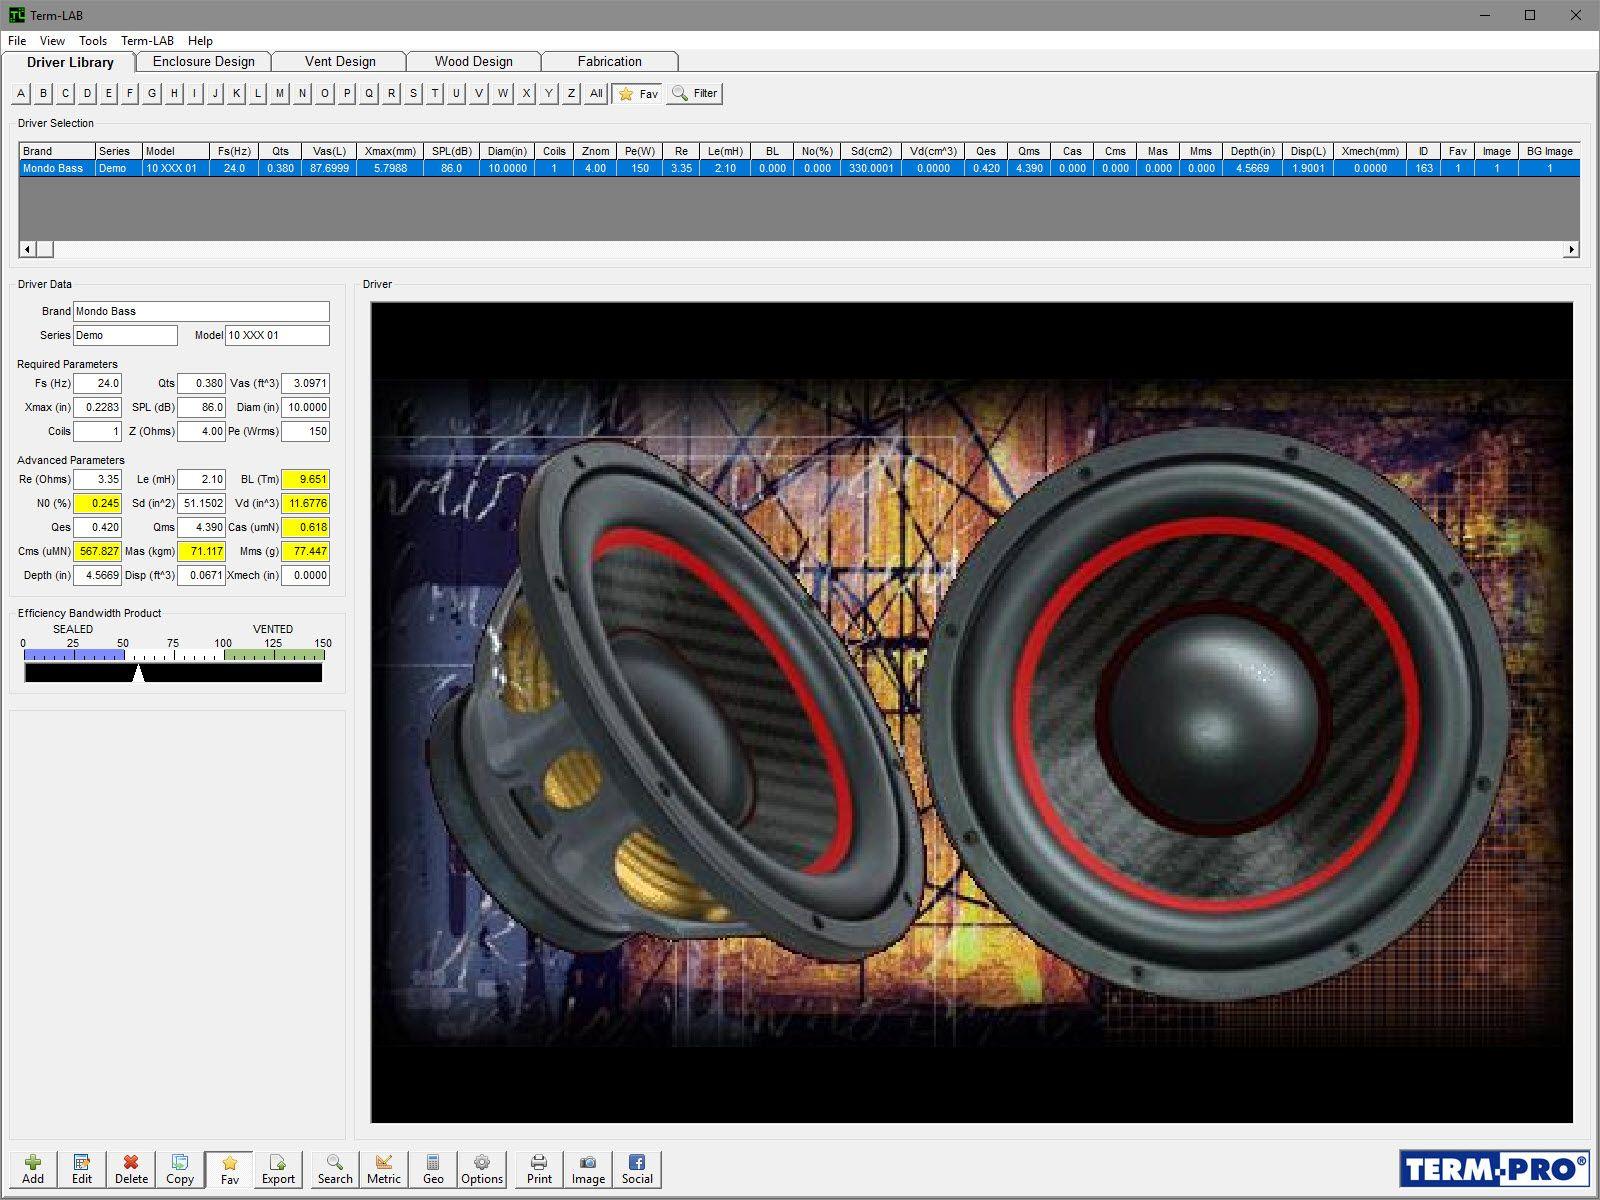 Term Pro Enclosure Design Software Download Software Design Subwoofer Box Design Software